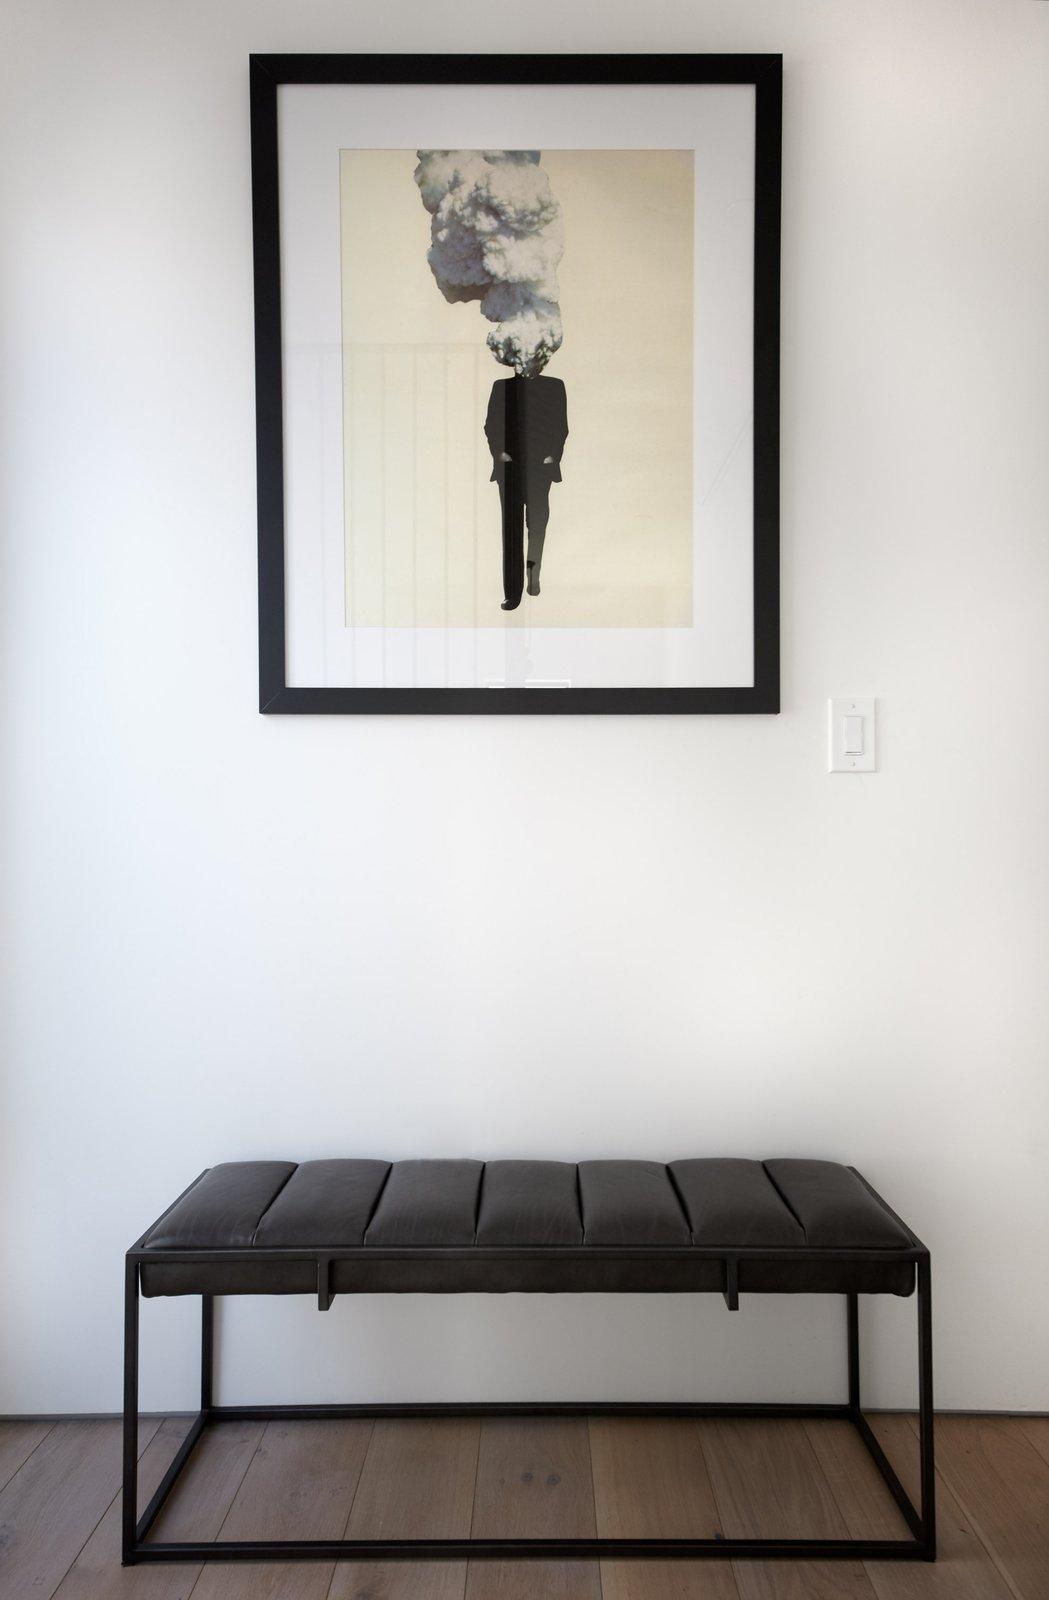 Hallway and Light Hardwood Floor Print by artist Richard Vergez.  Normal Heights Residence